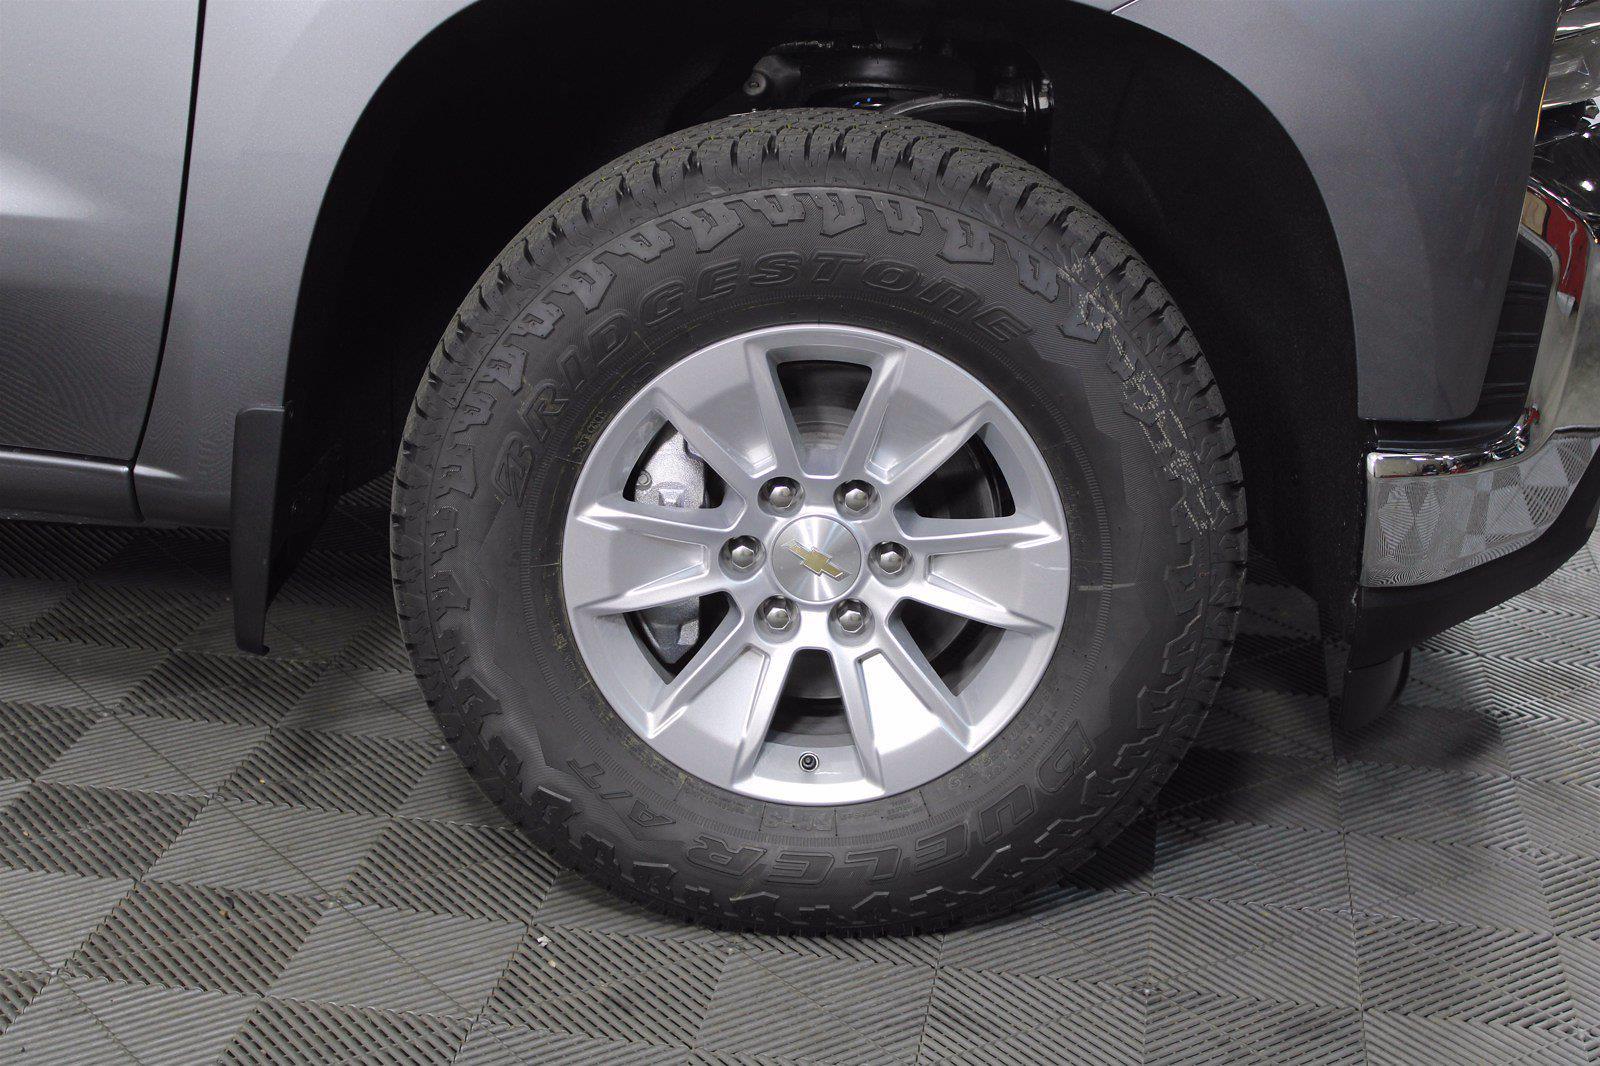 2021 Chevrolet Silverado 1500 Crew Cab 4x4, Pickup #D111136 - photo 6